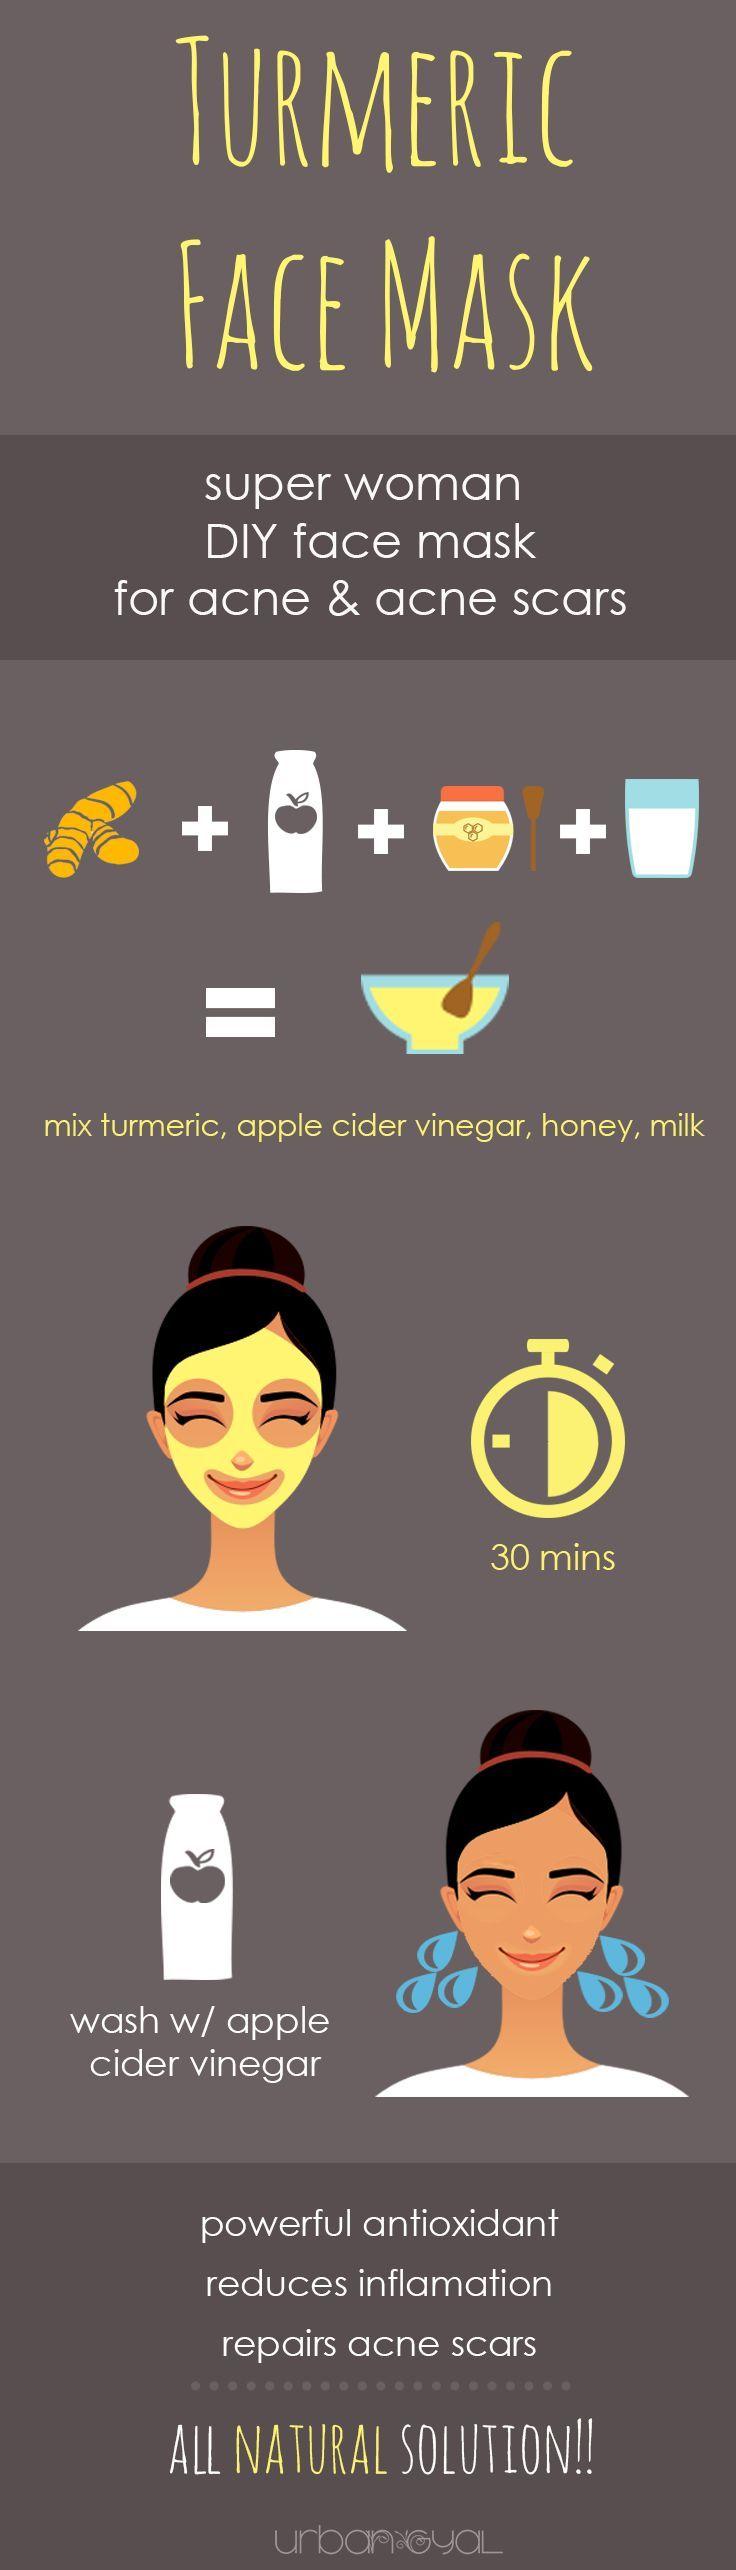 Turmeric Face Mask Recipe BEAUTY AND STYLE Diy